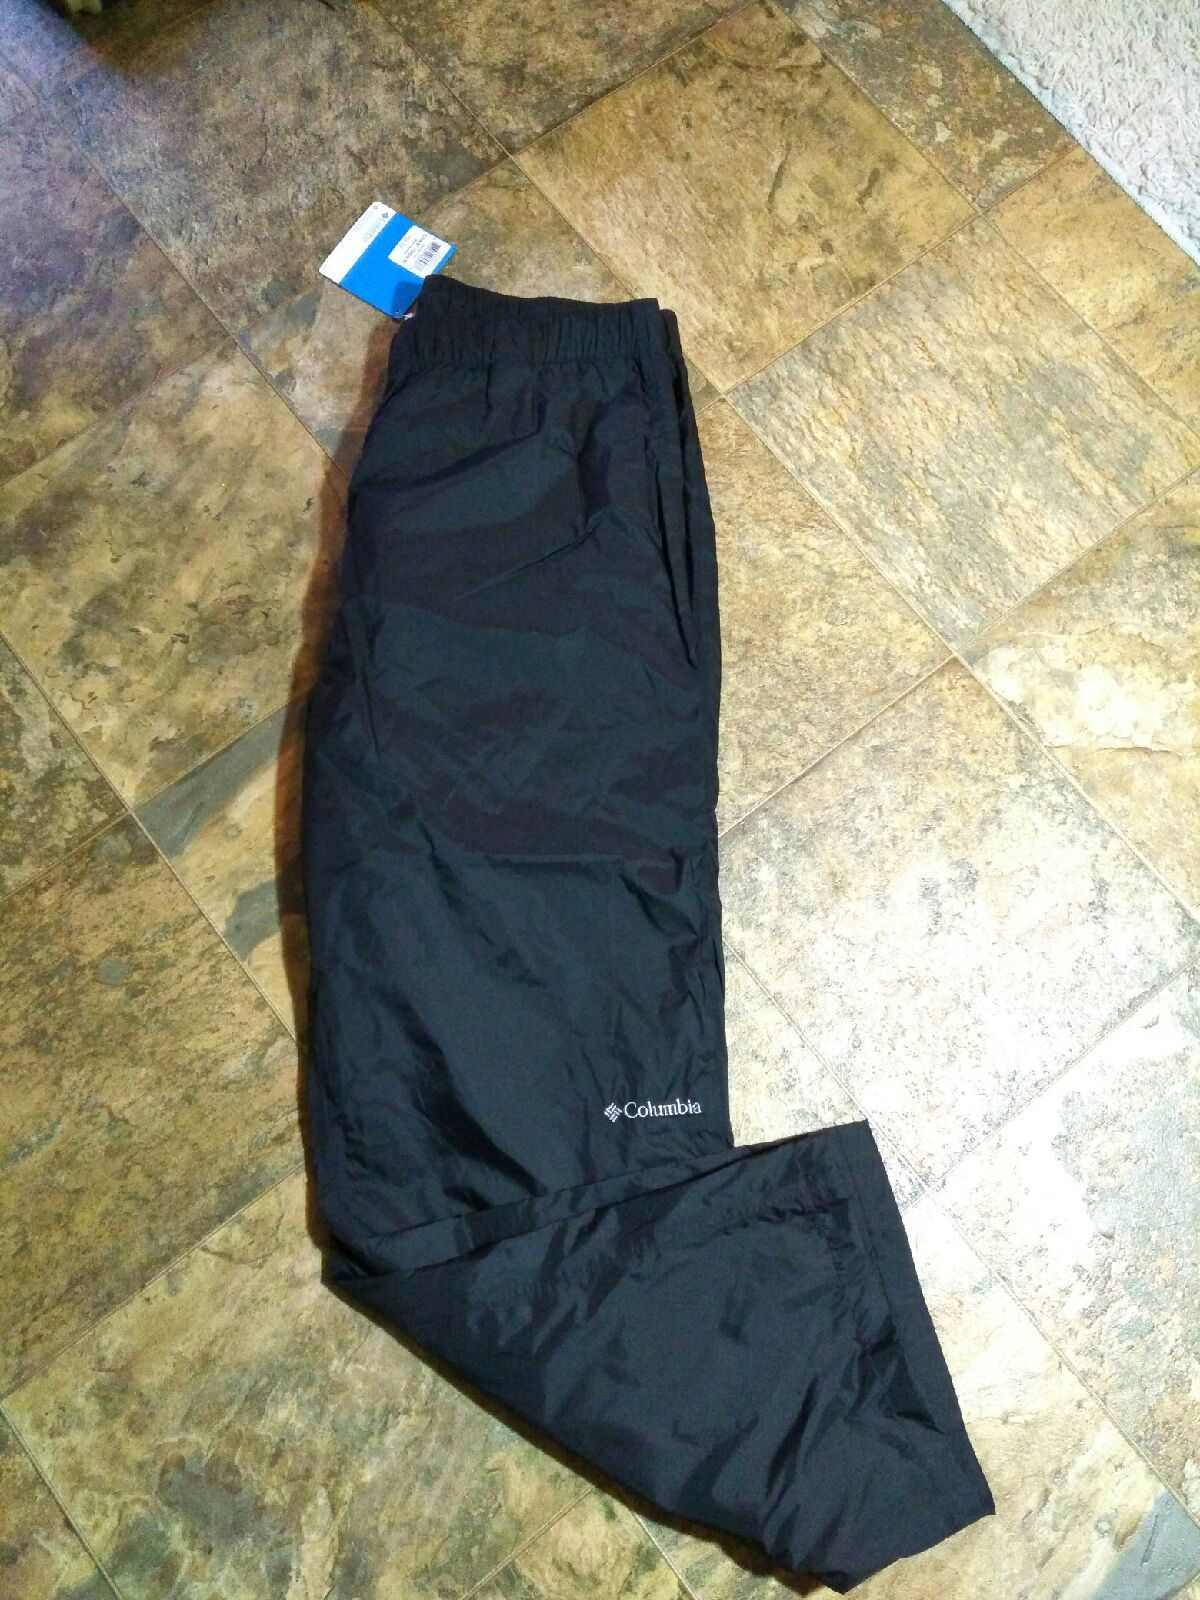 NWT Columbia Waterproof Pants XL